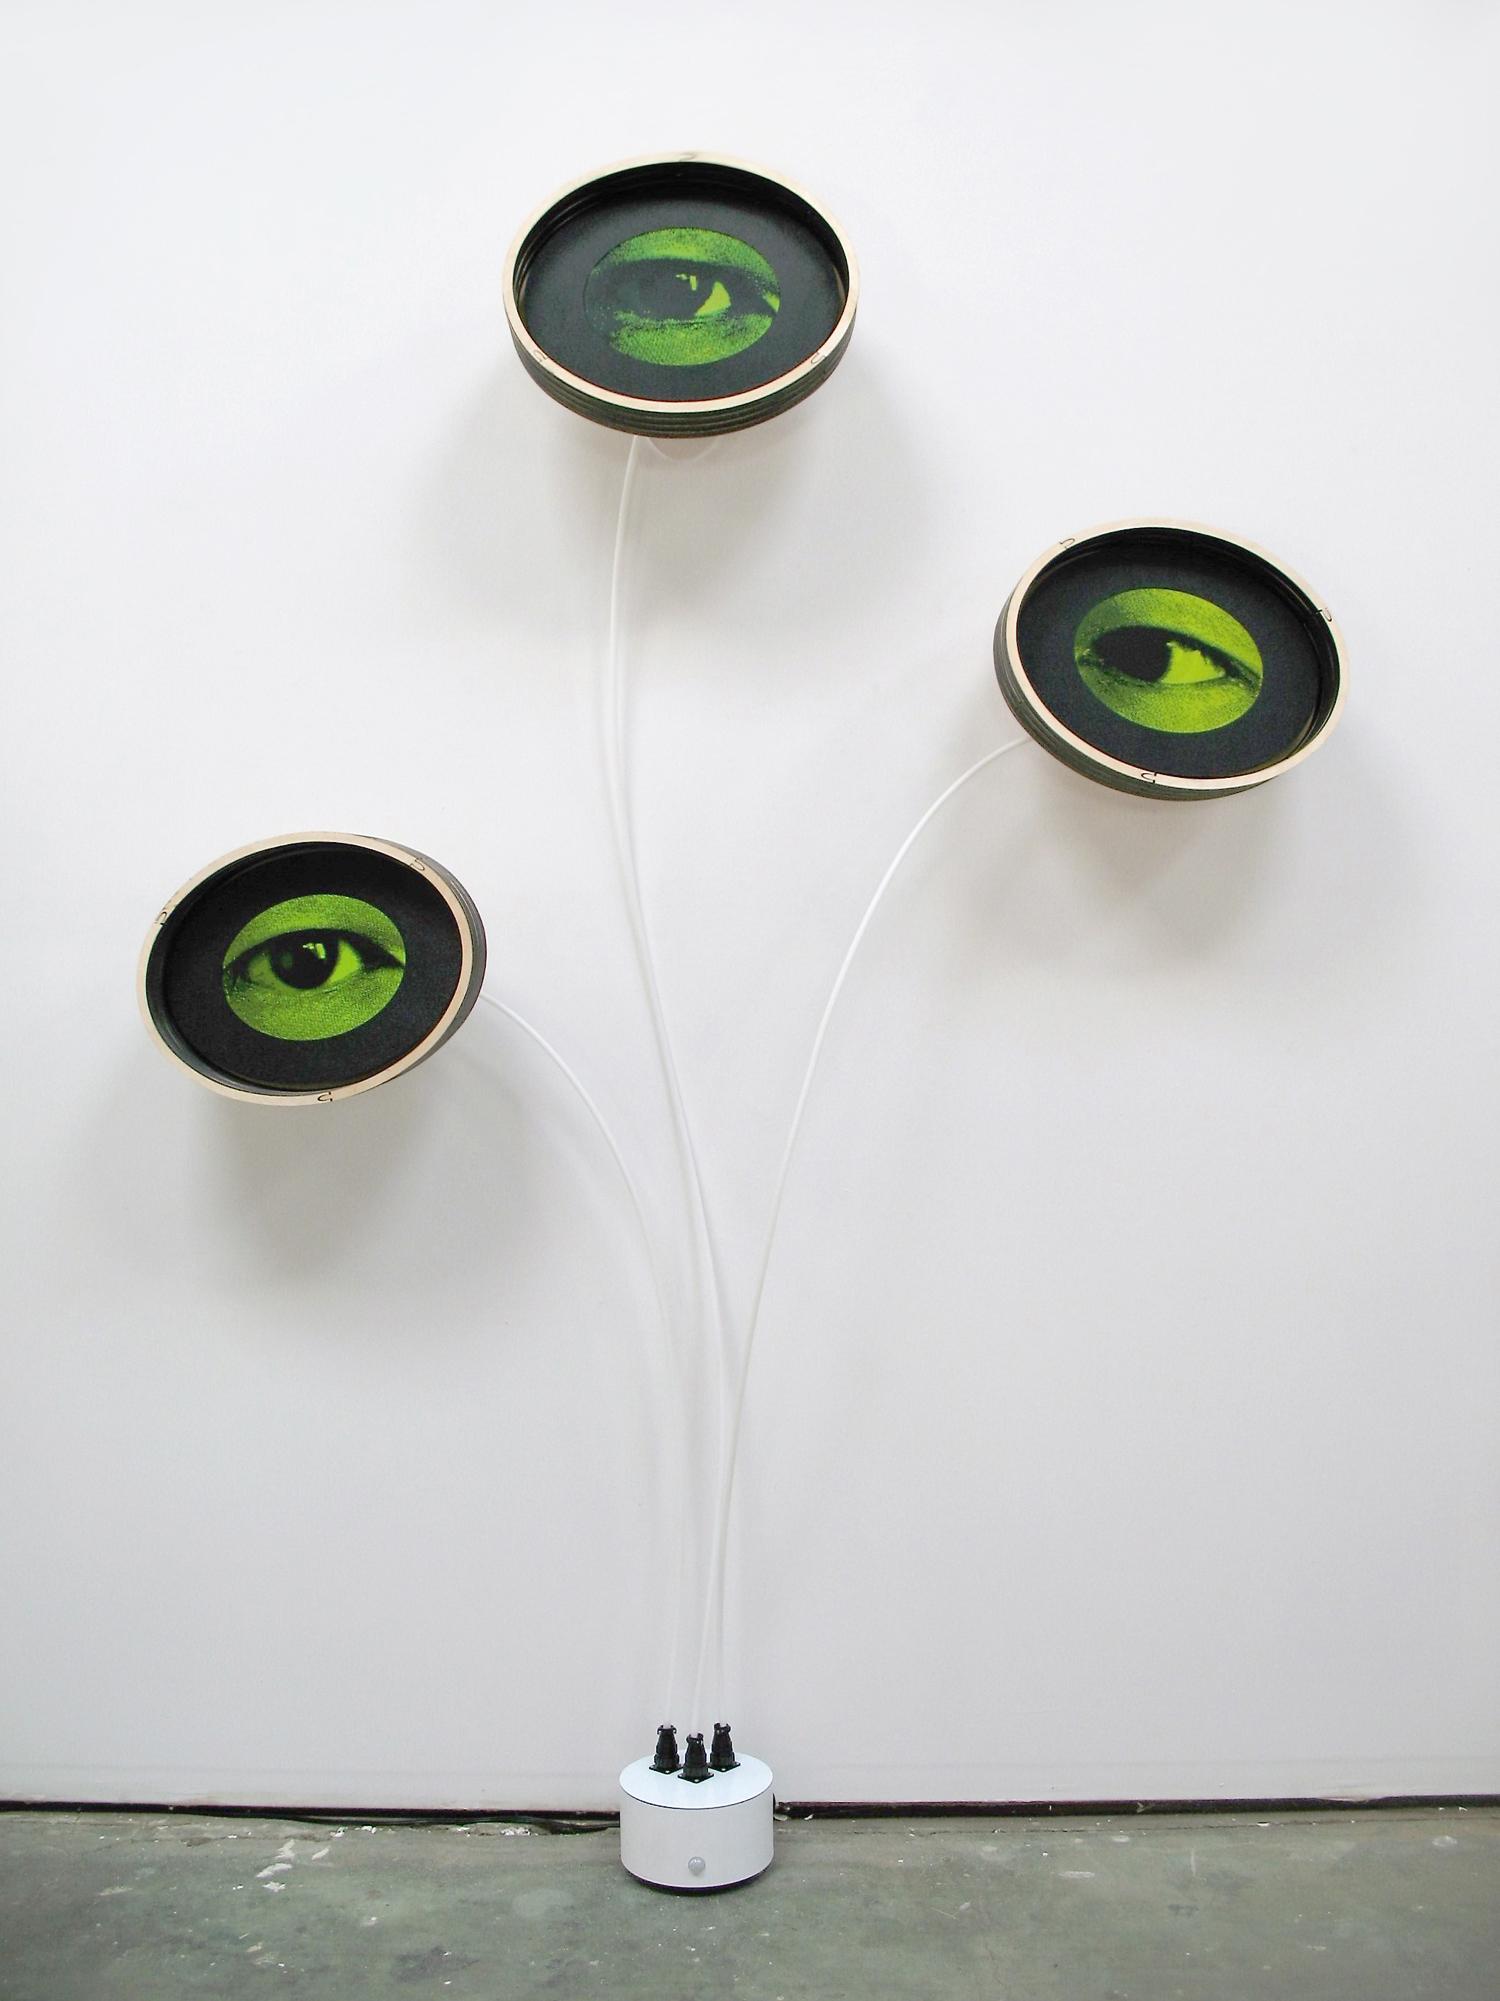 Alan Rath, Eyeris VIII, 2016. Sculpture: Birch plywood, acrylic, polyethylene, aluminum, custom electronics, LCDs, 87 x 60 x 10 inches. Courtesy of the artist and Carl Solway Gallery